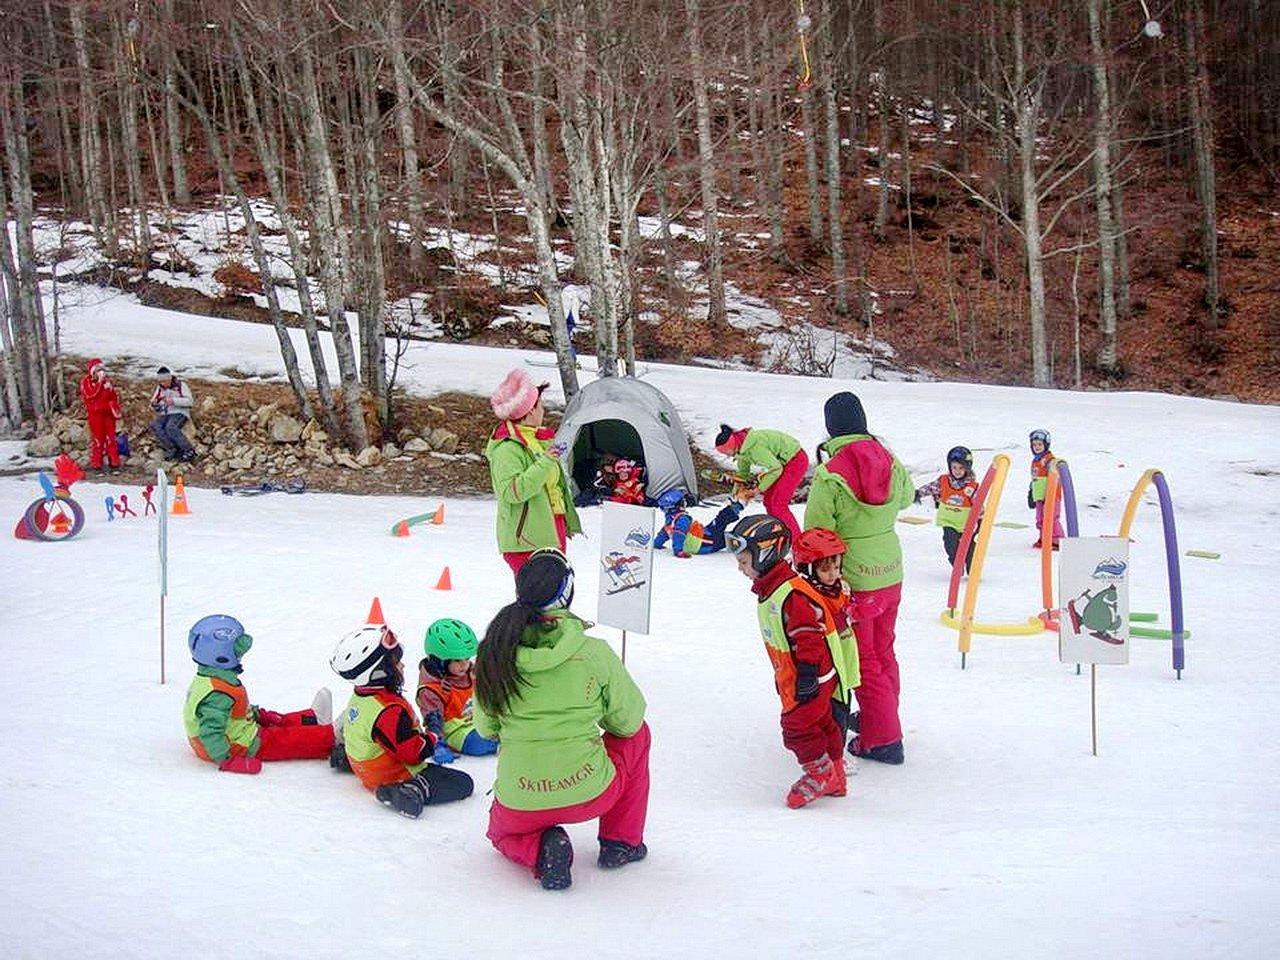 skiteam.gr-ski-academy-thessaloniki-2nd-weekend-18-19-january-2015-3-5-pigadiai-04